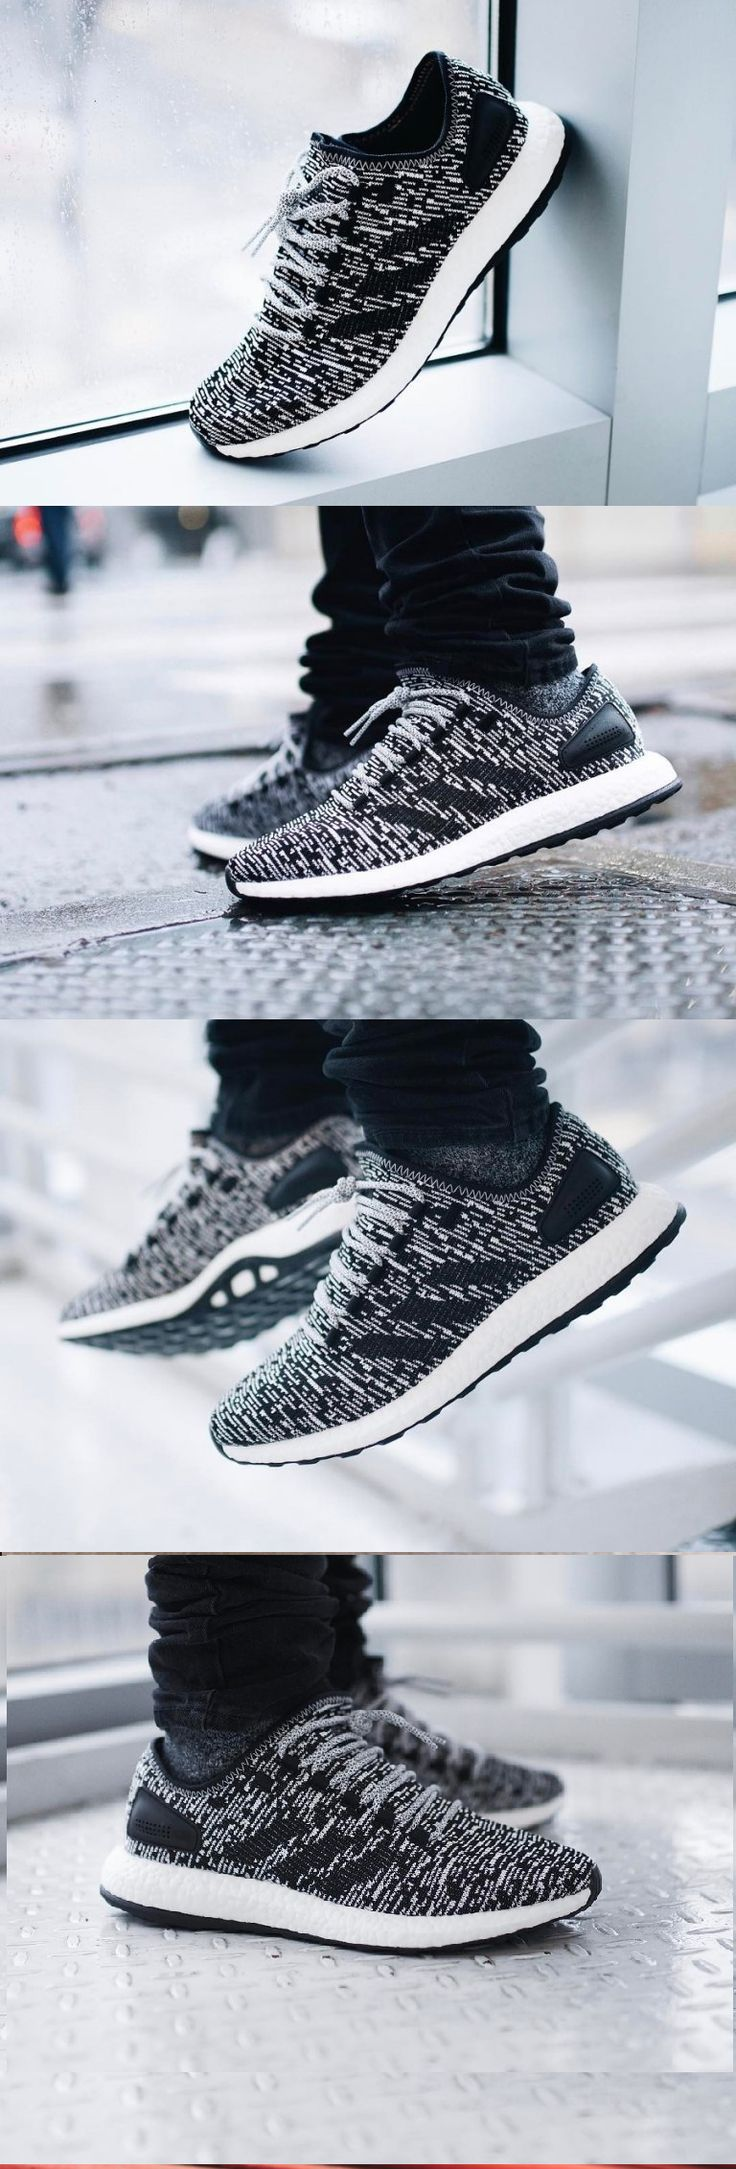 adidas Pure Boost LTD Black White S80704